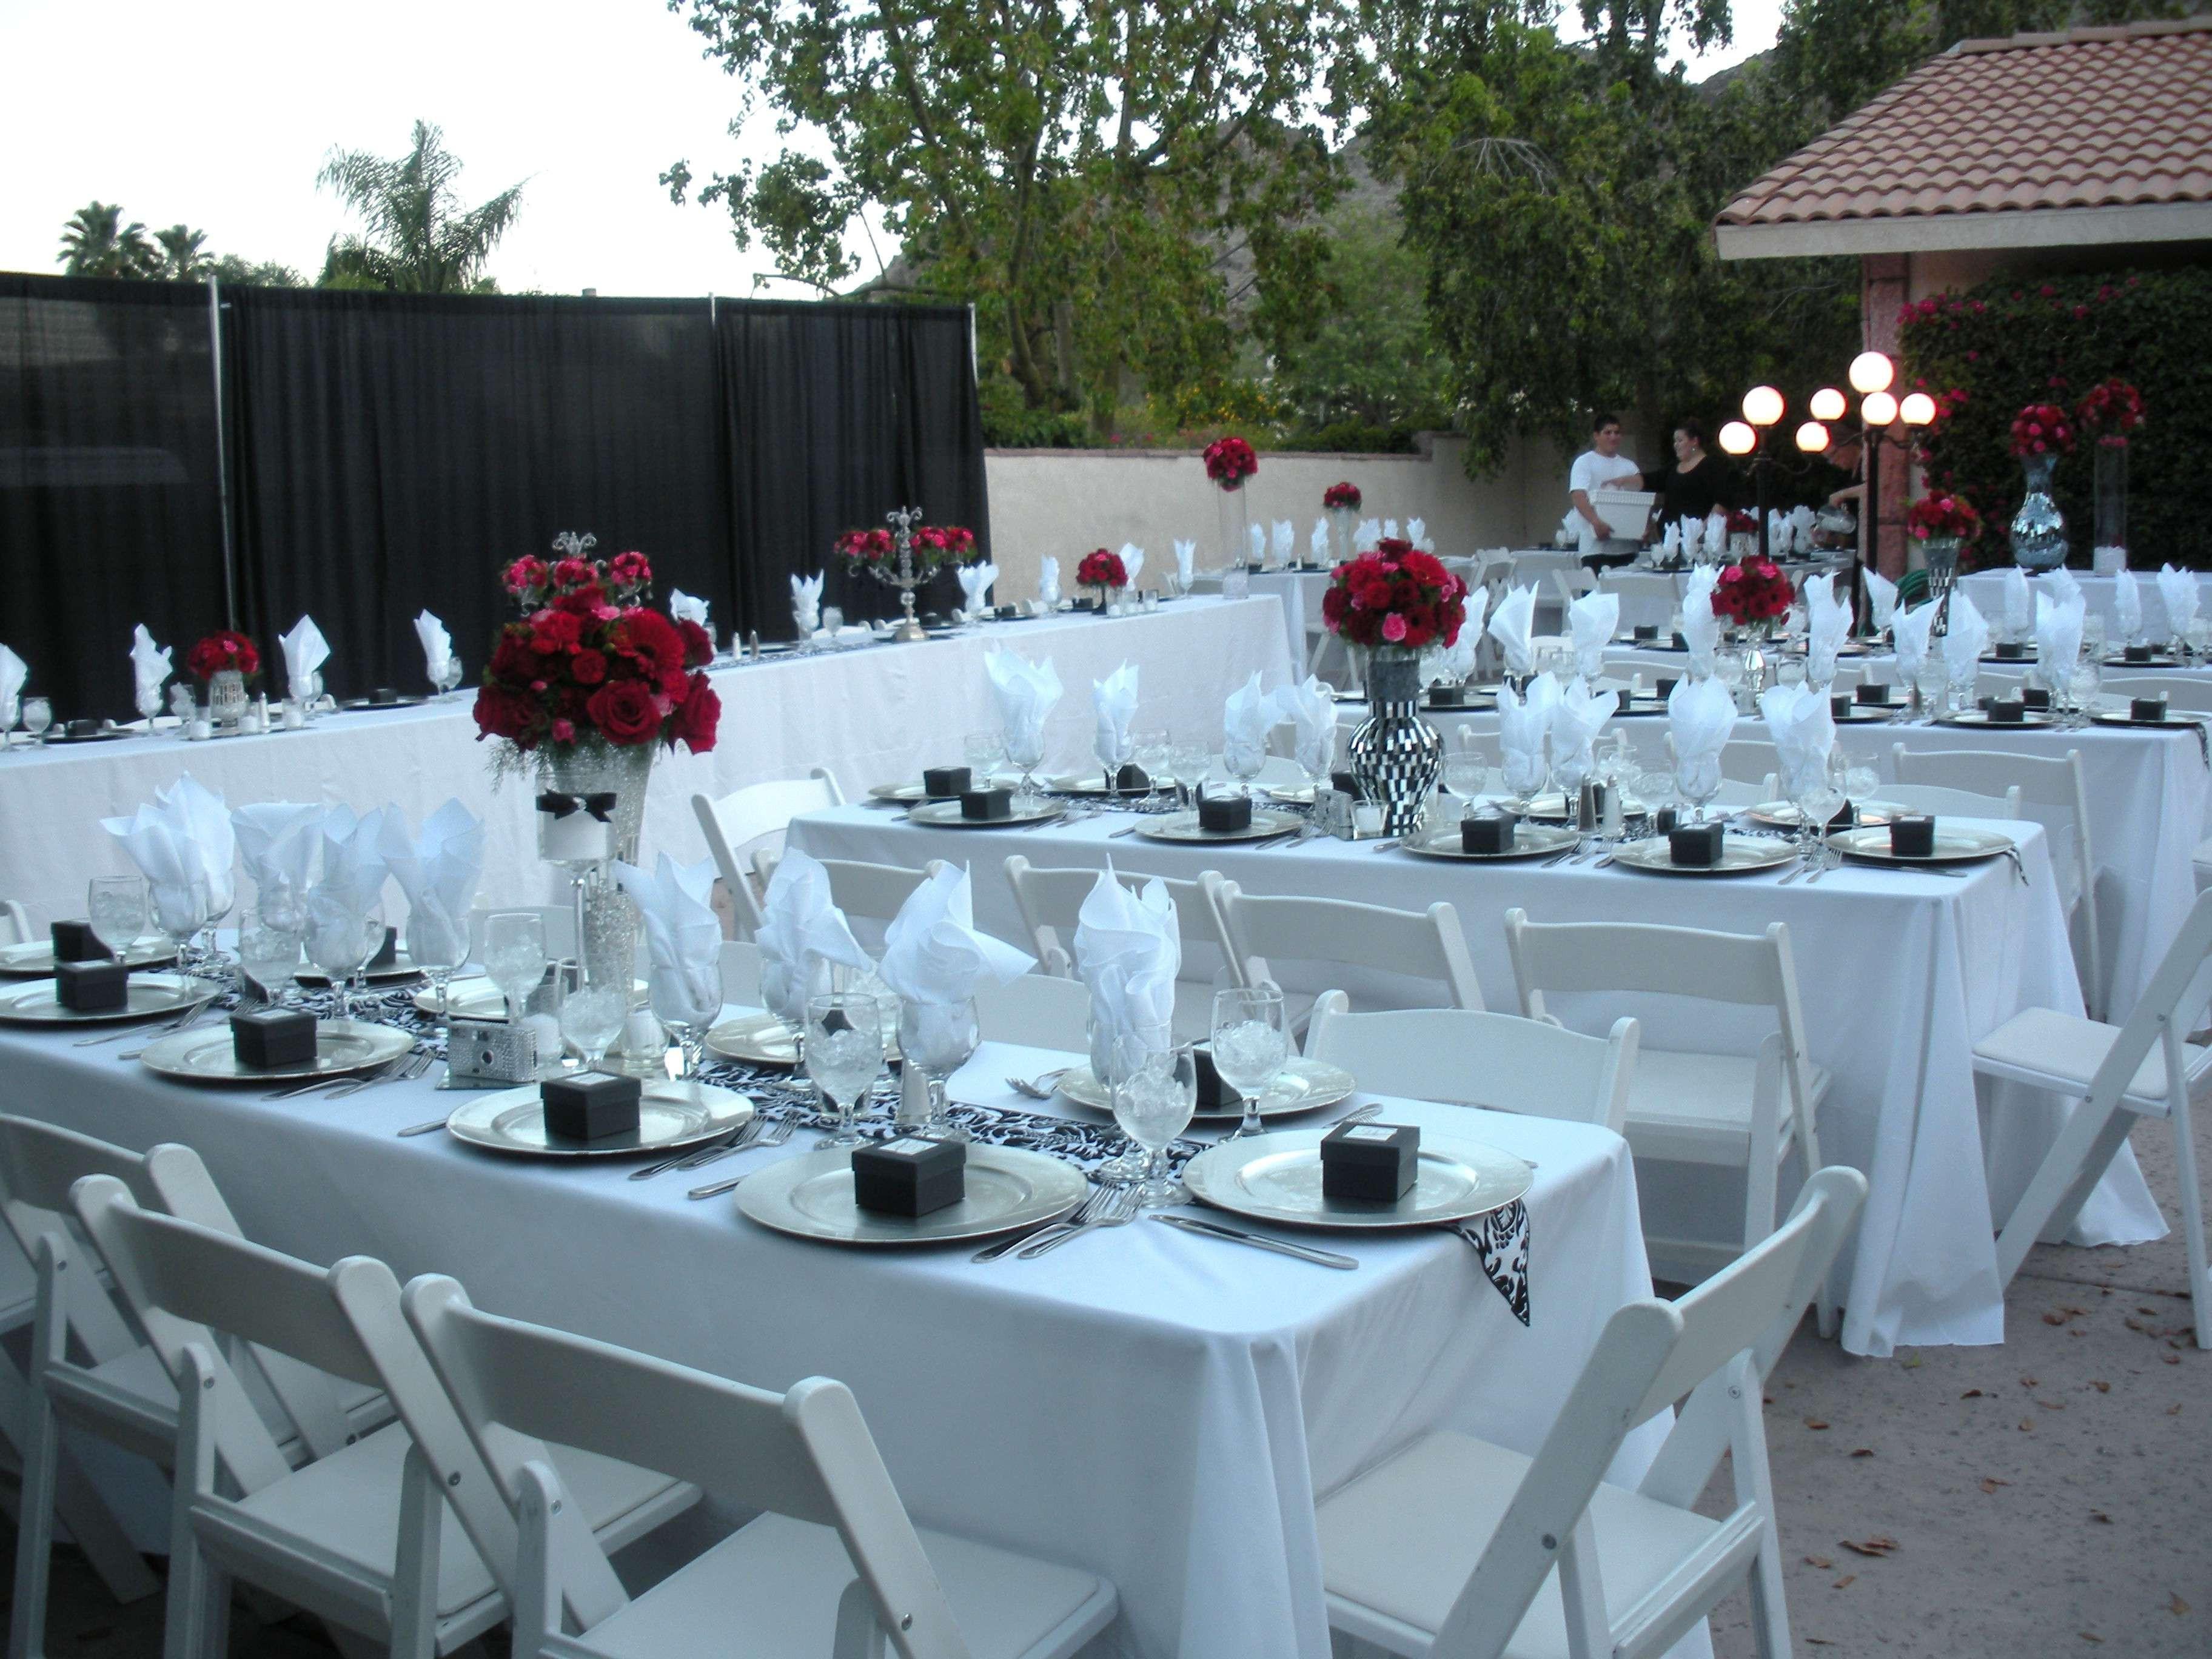 candy bar vase arrangements of table des saveurs unique flower vase table 04h vases tablei 0d within related post